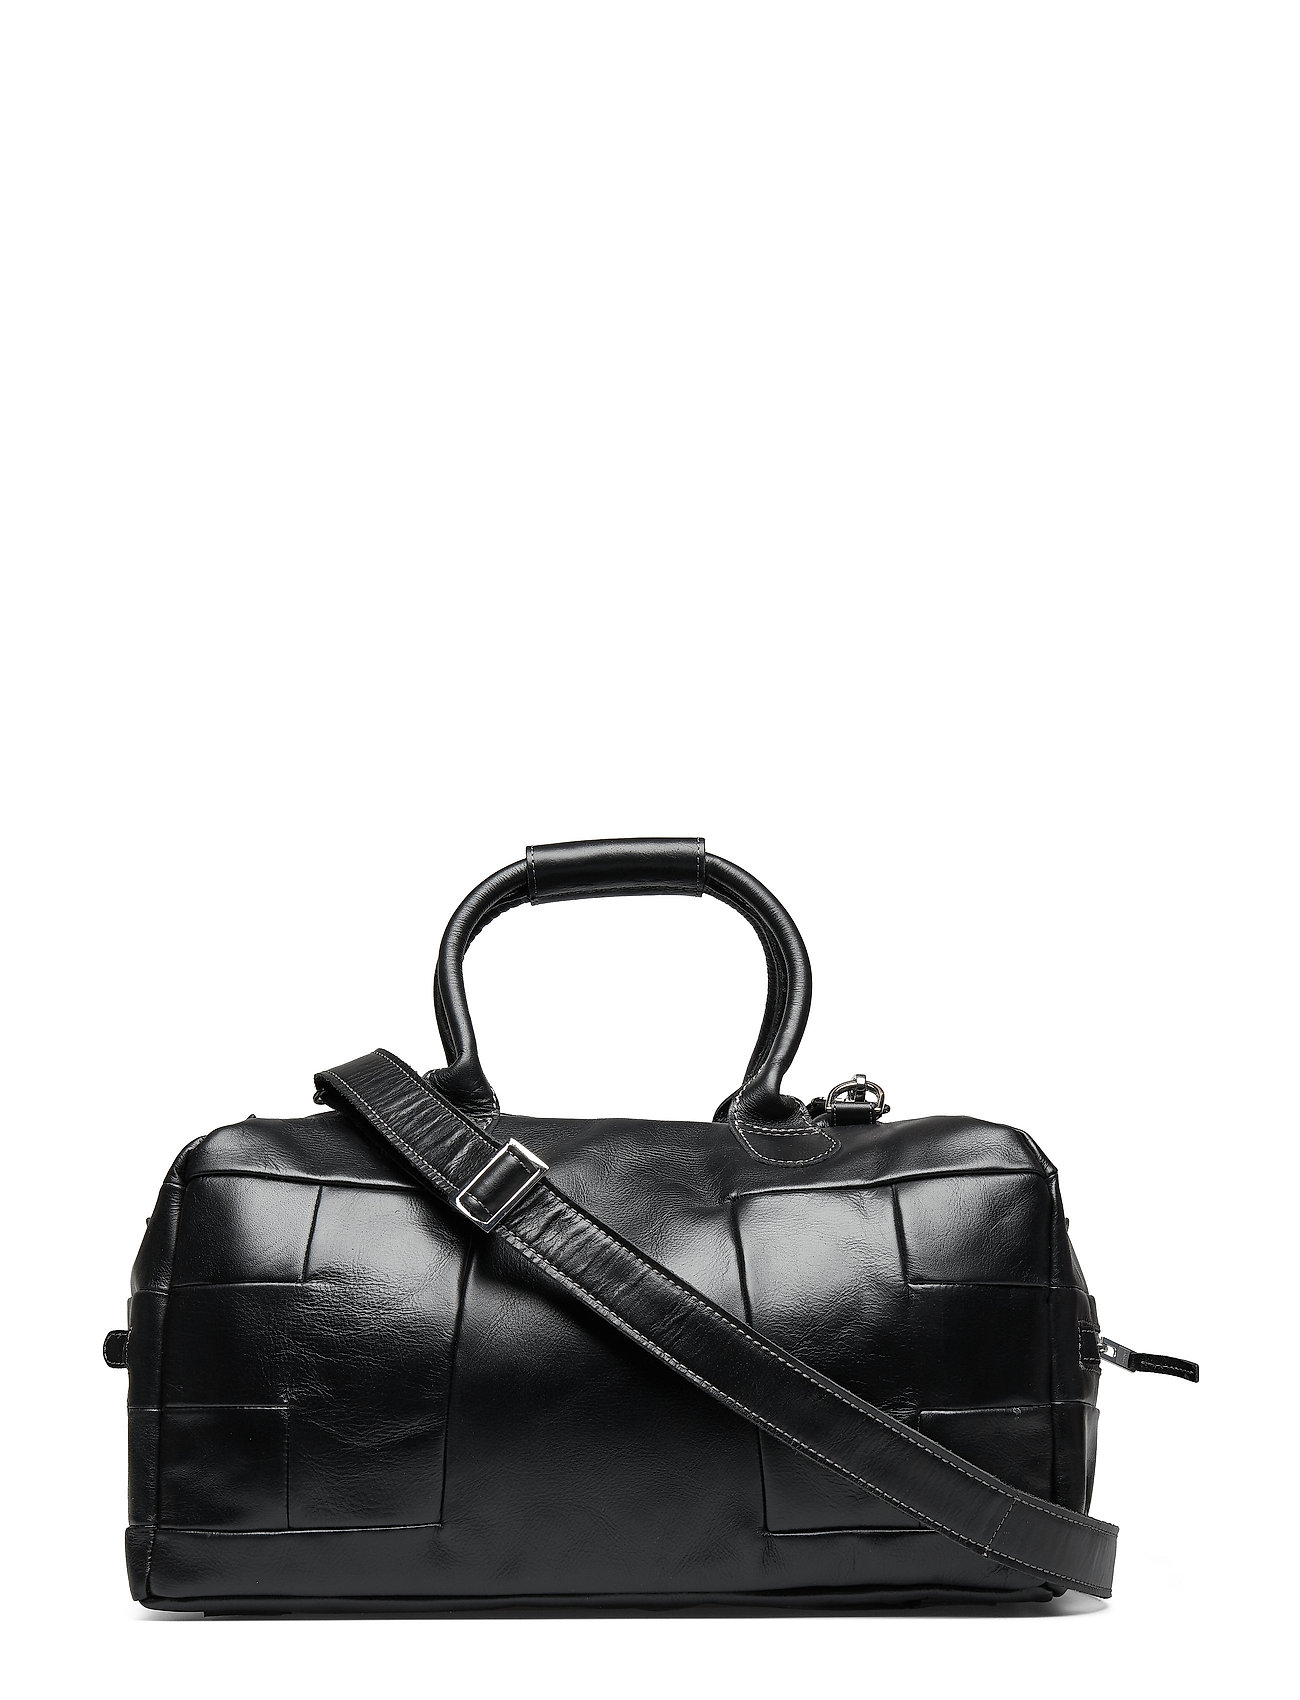 Royal RepubliQ Ball Bag - BLACK